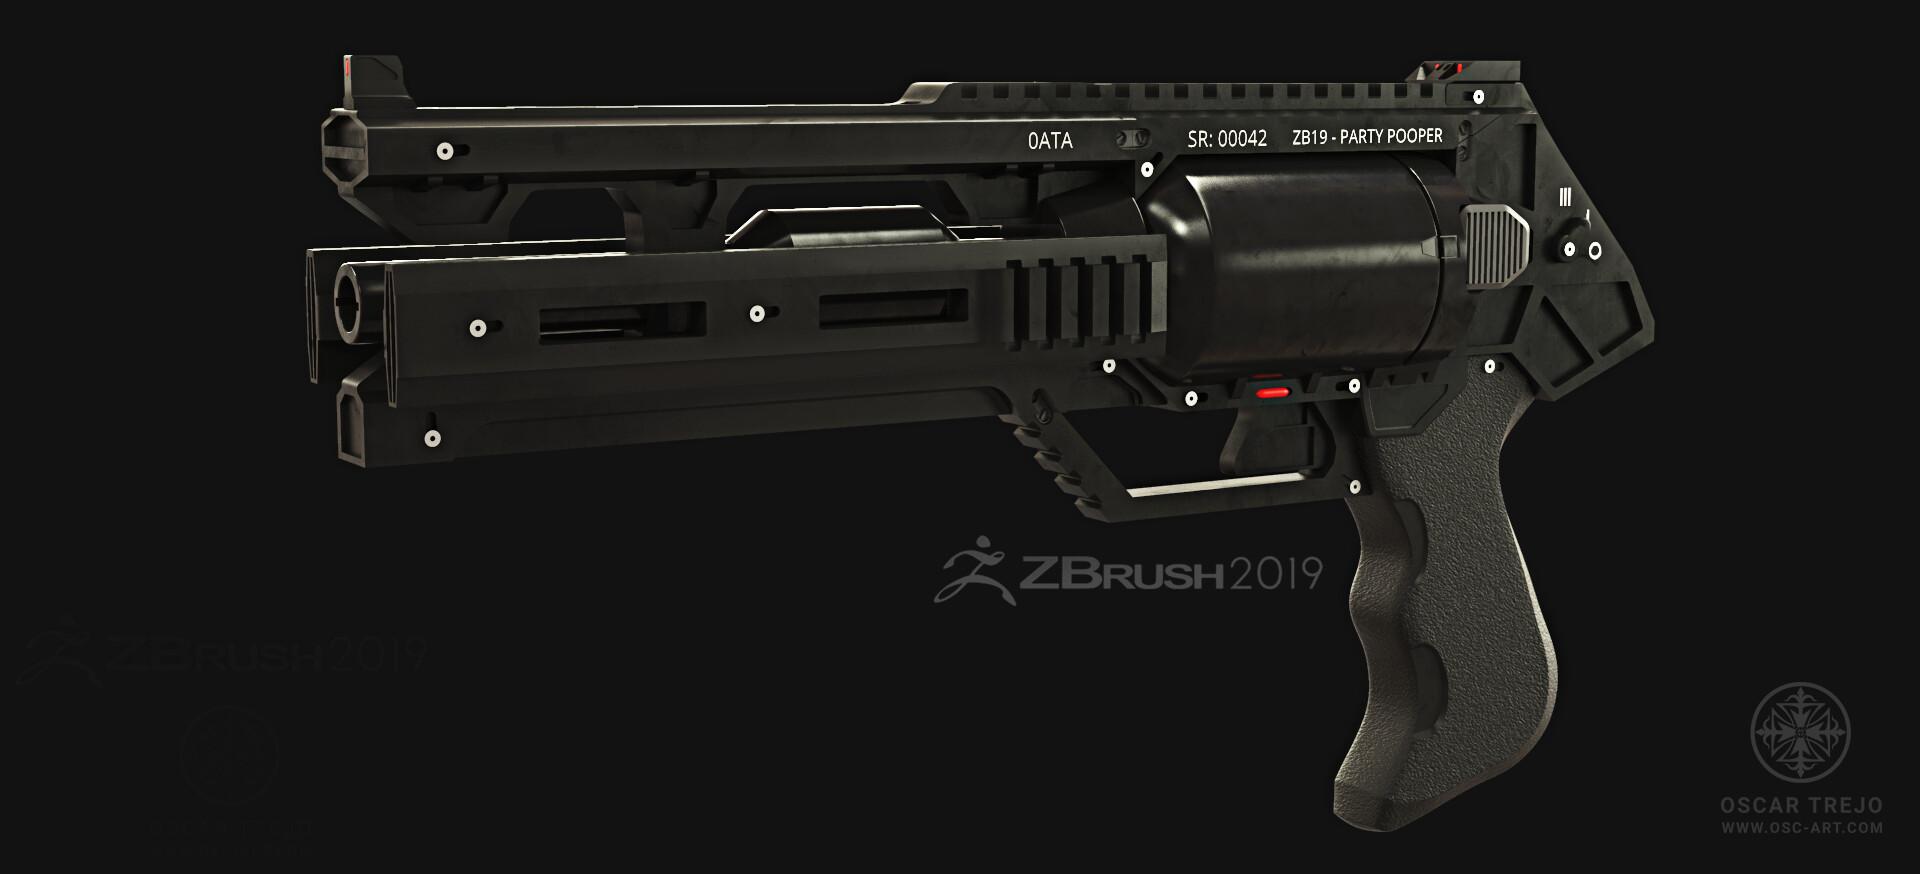 Osc-art - Zbrush 2019 Beta